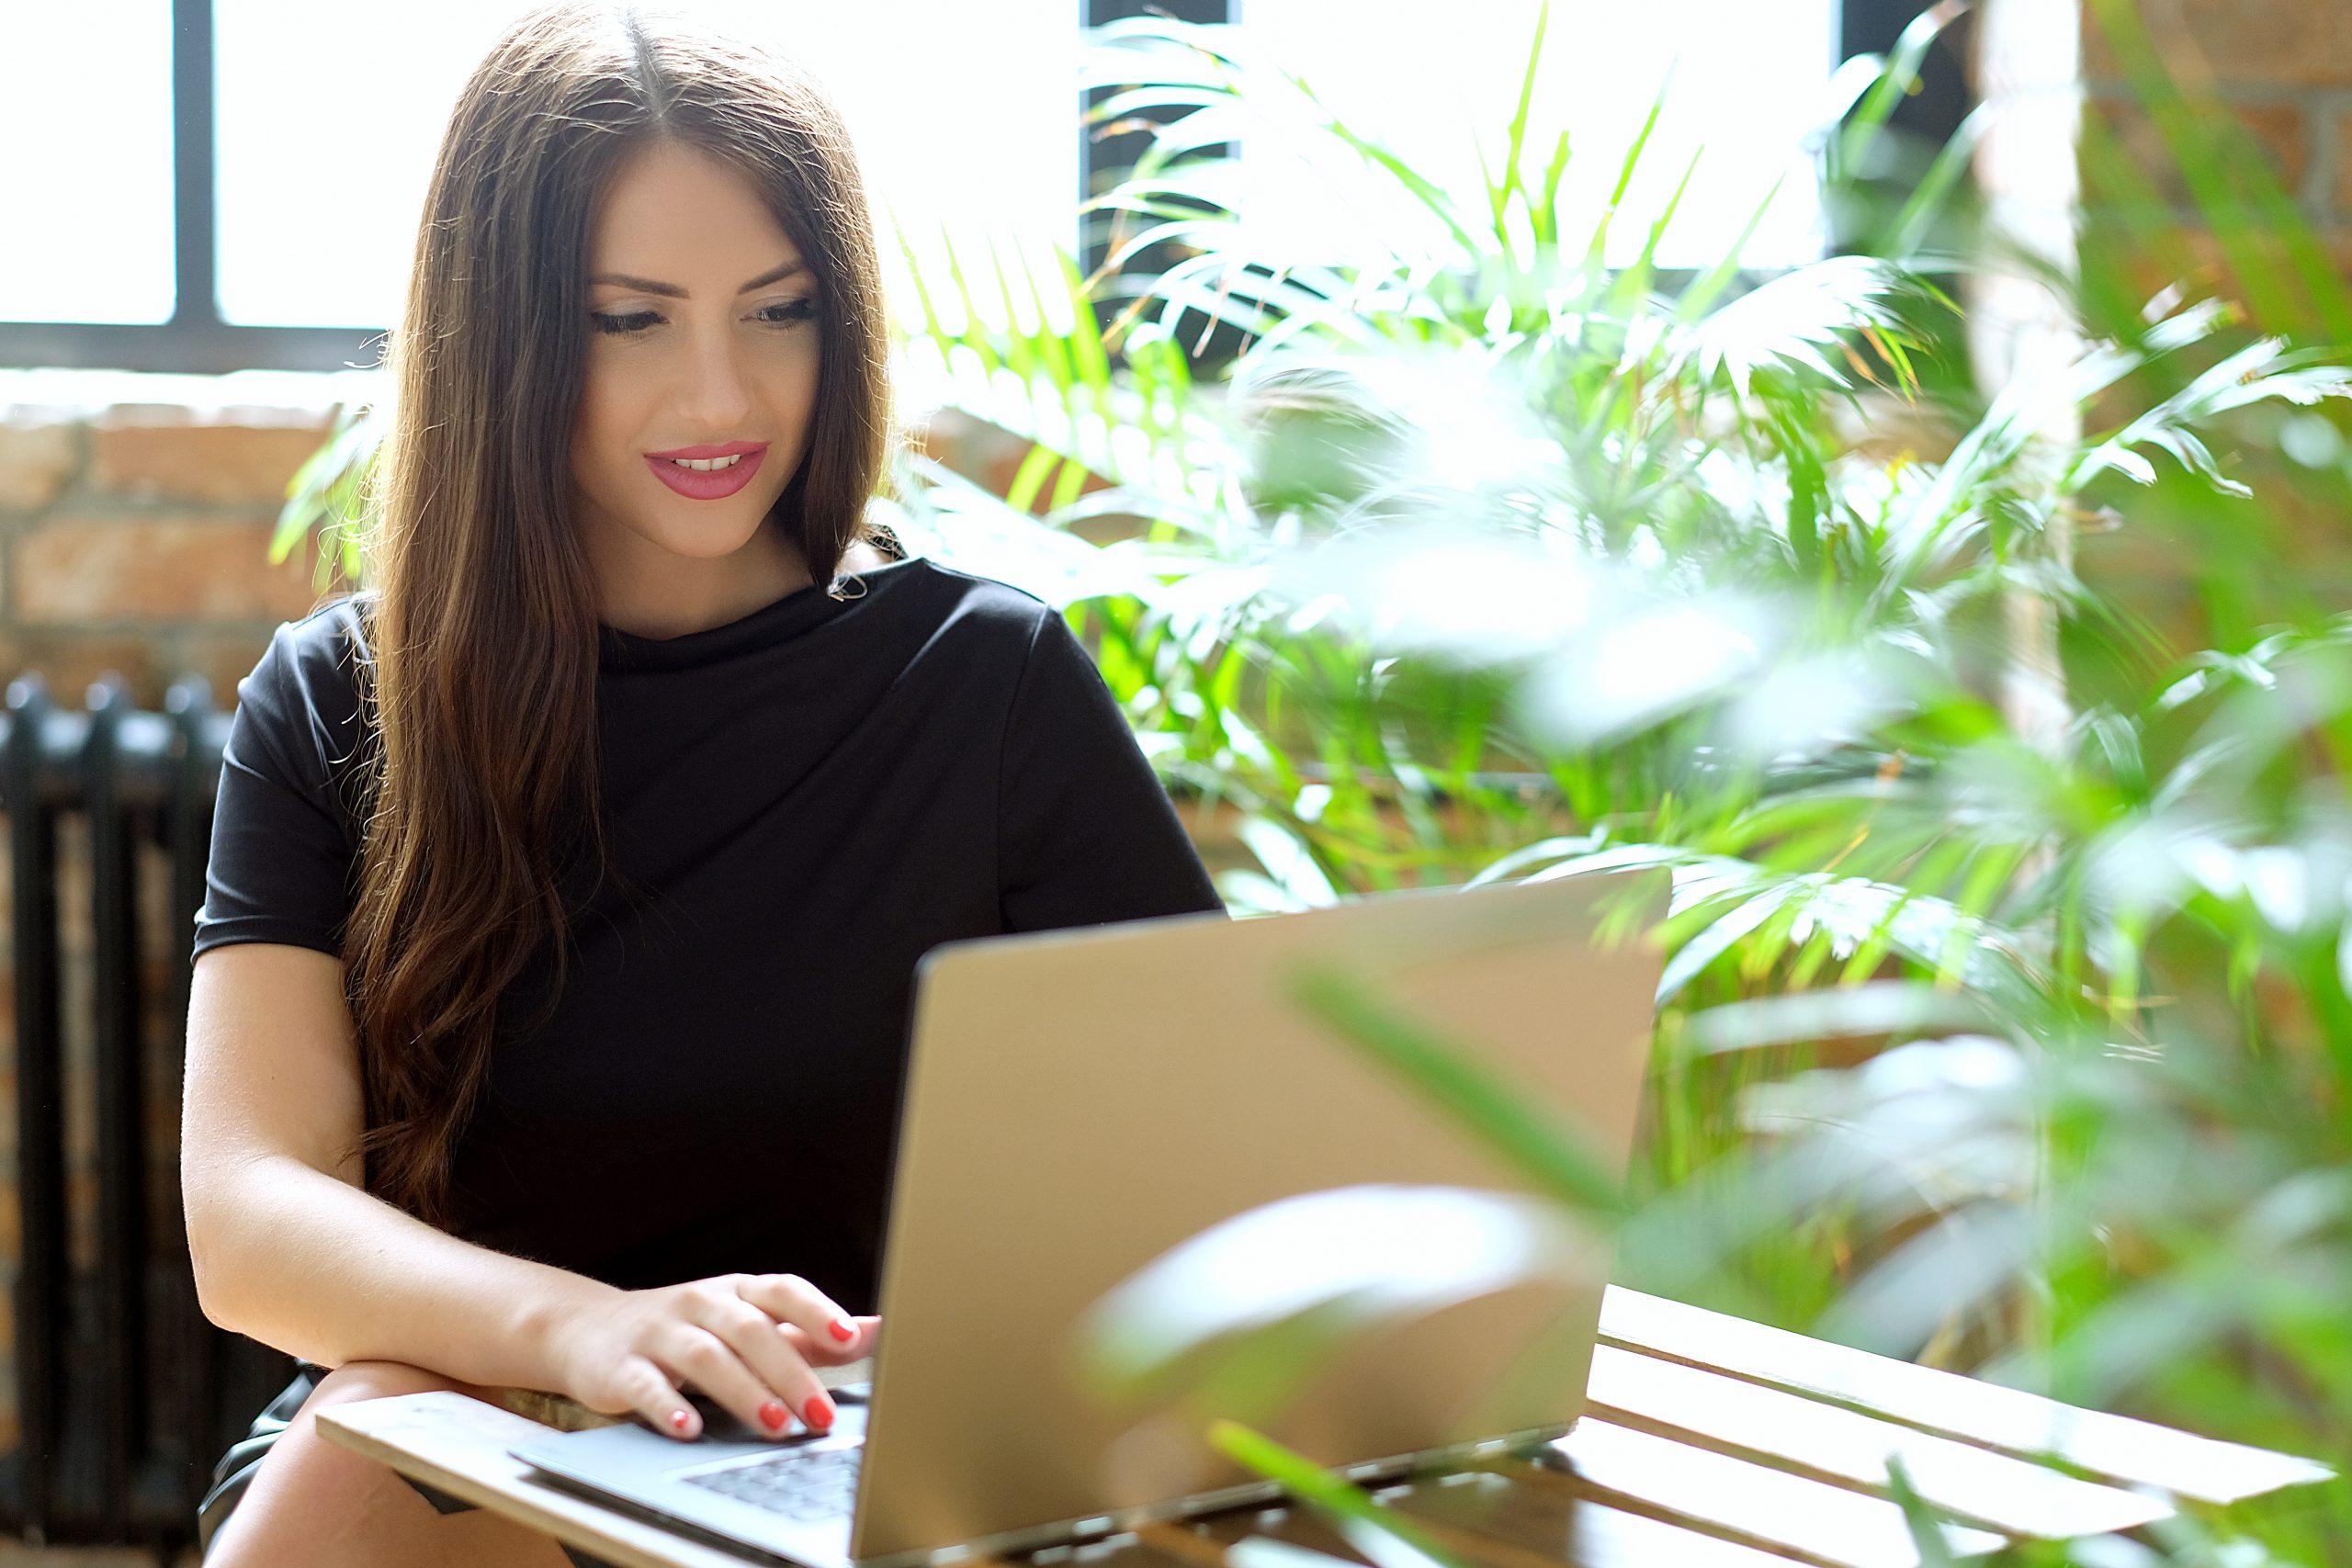 Beautiful woman laptop mail order bride Pricing